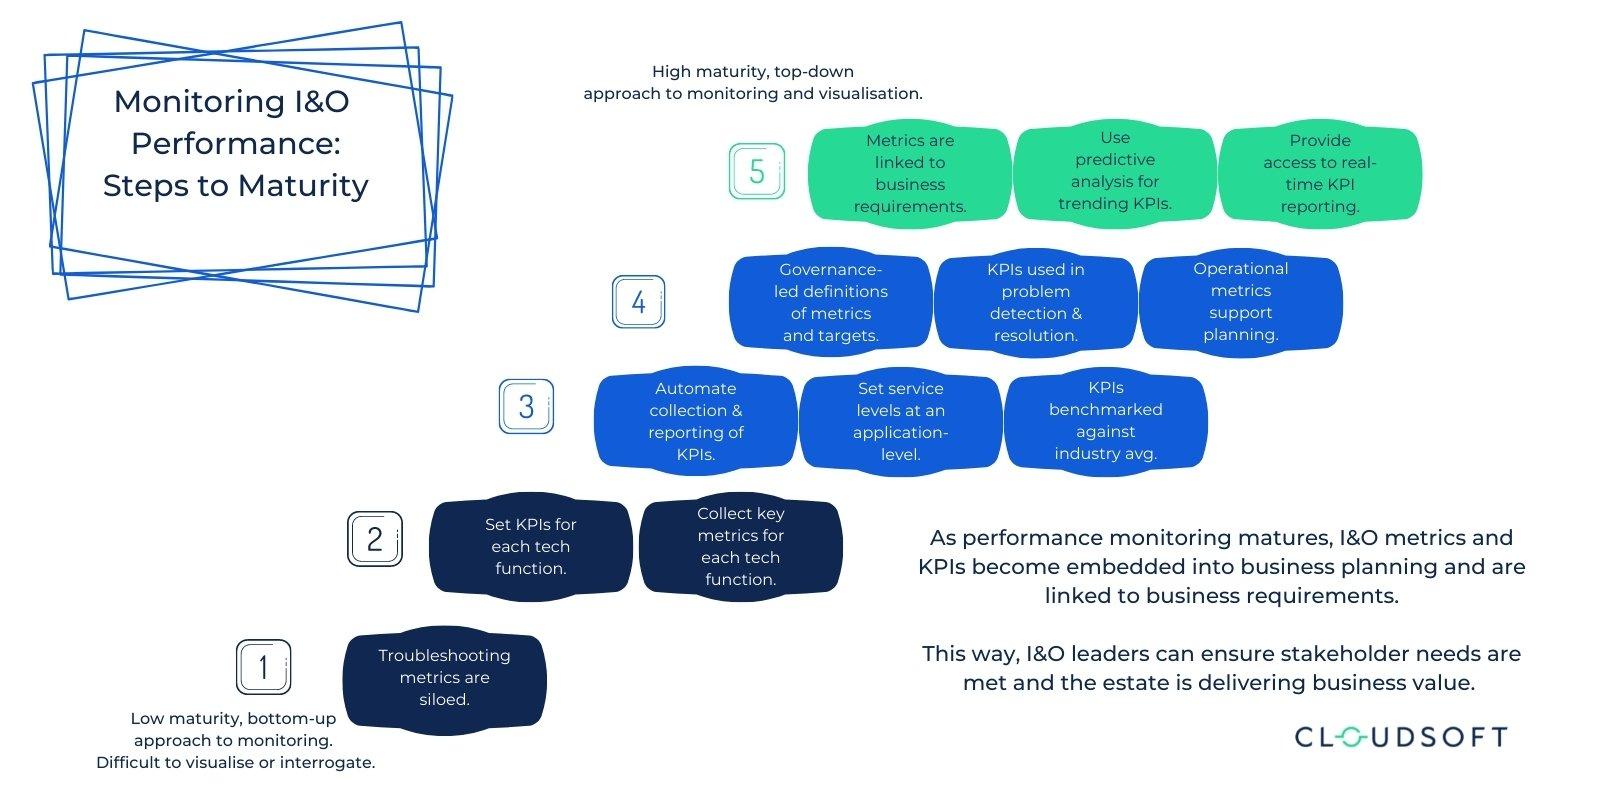 Gartner Strategic Priorities Maturity Model - I&O performance 1